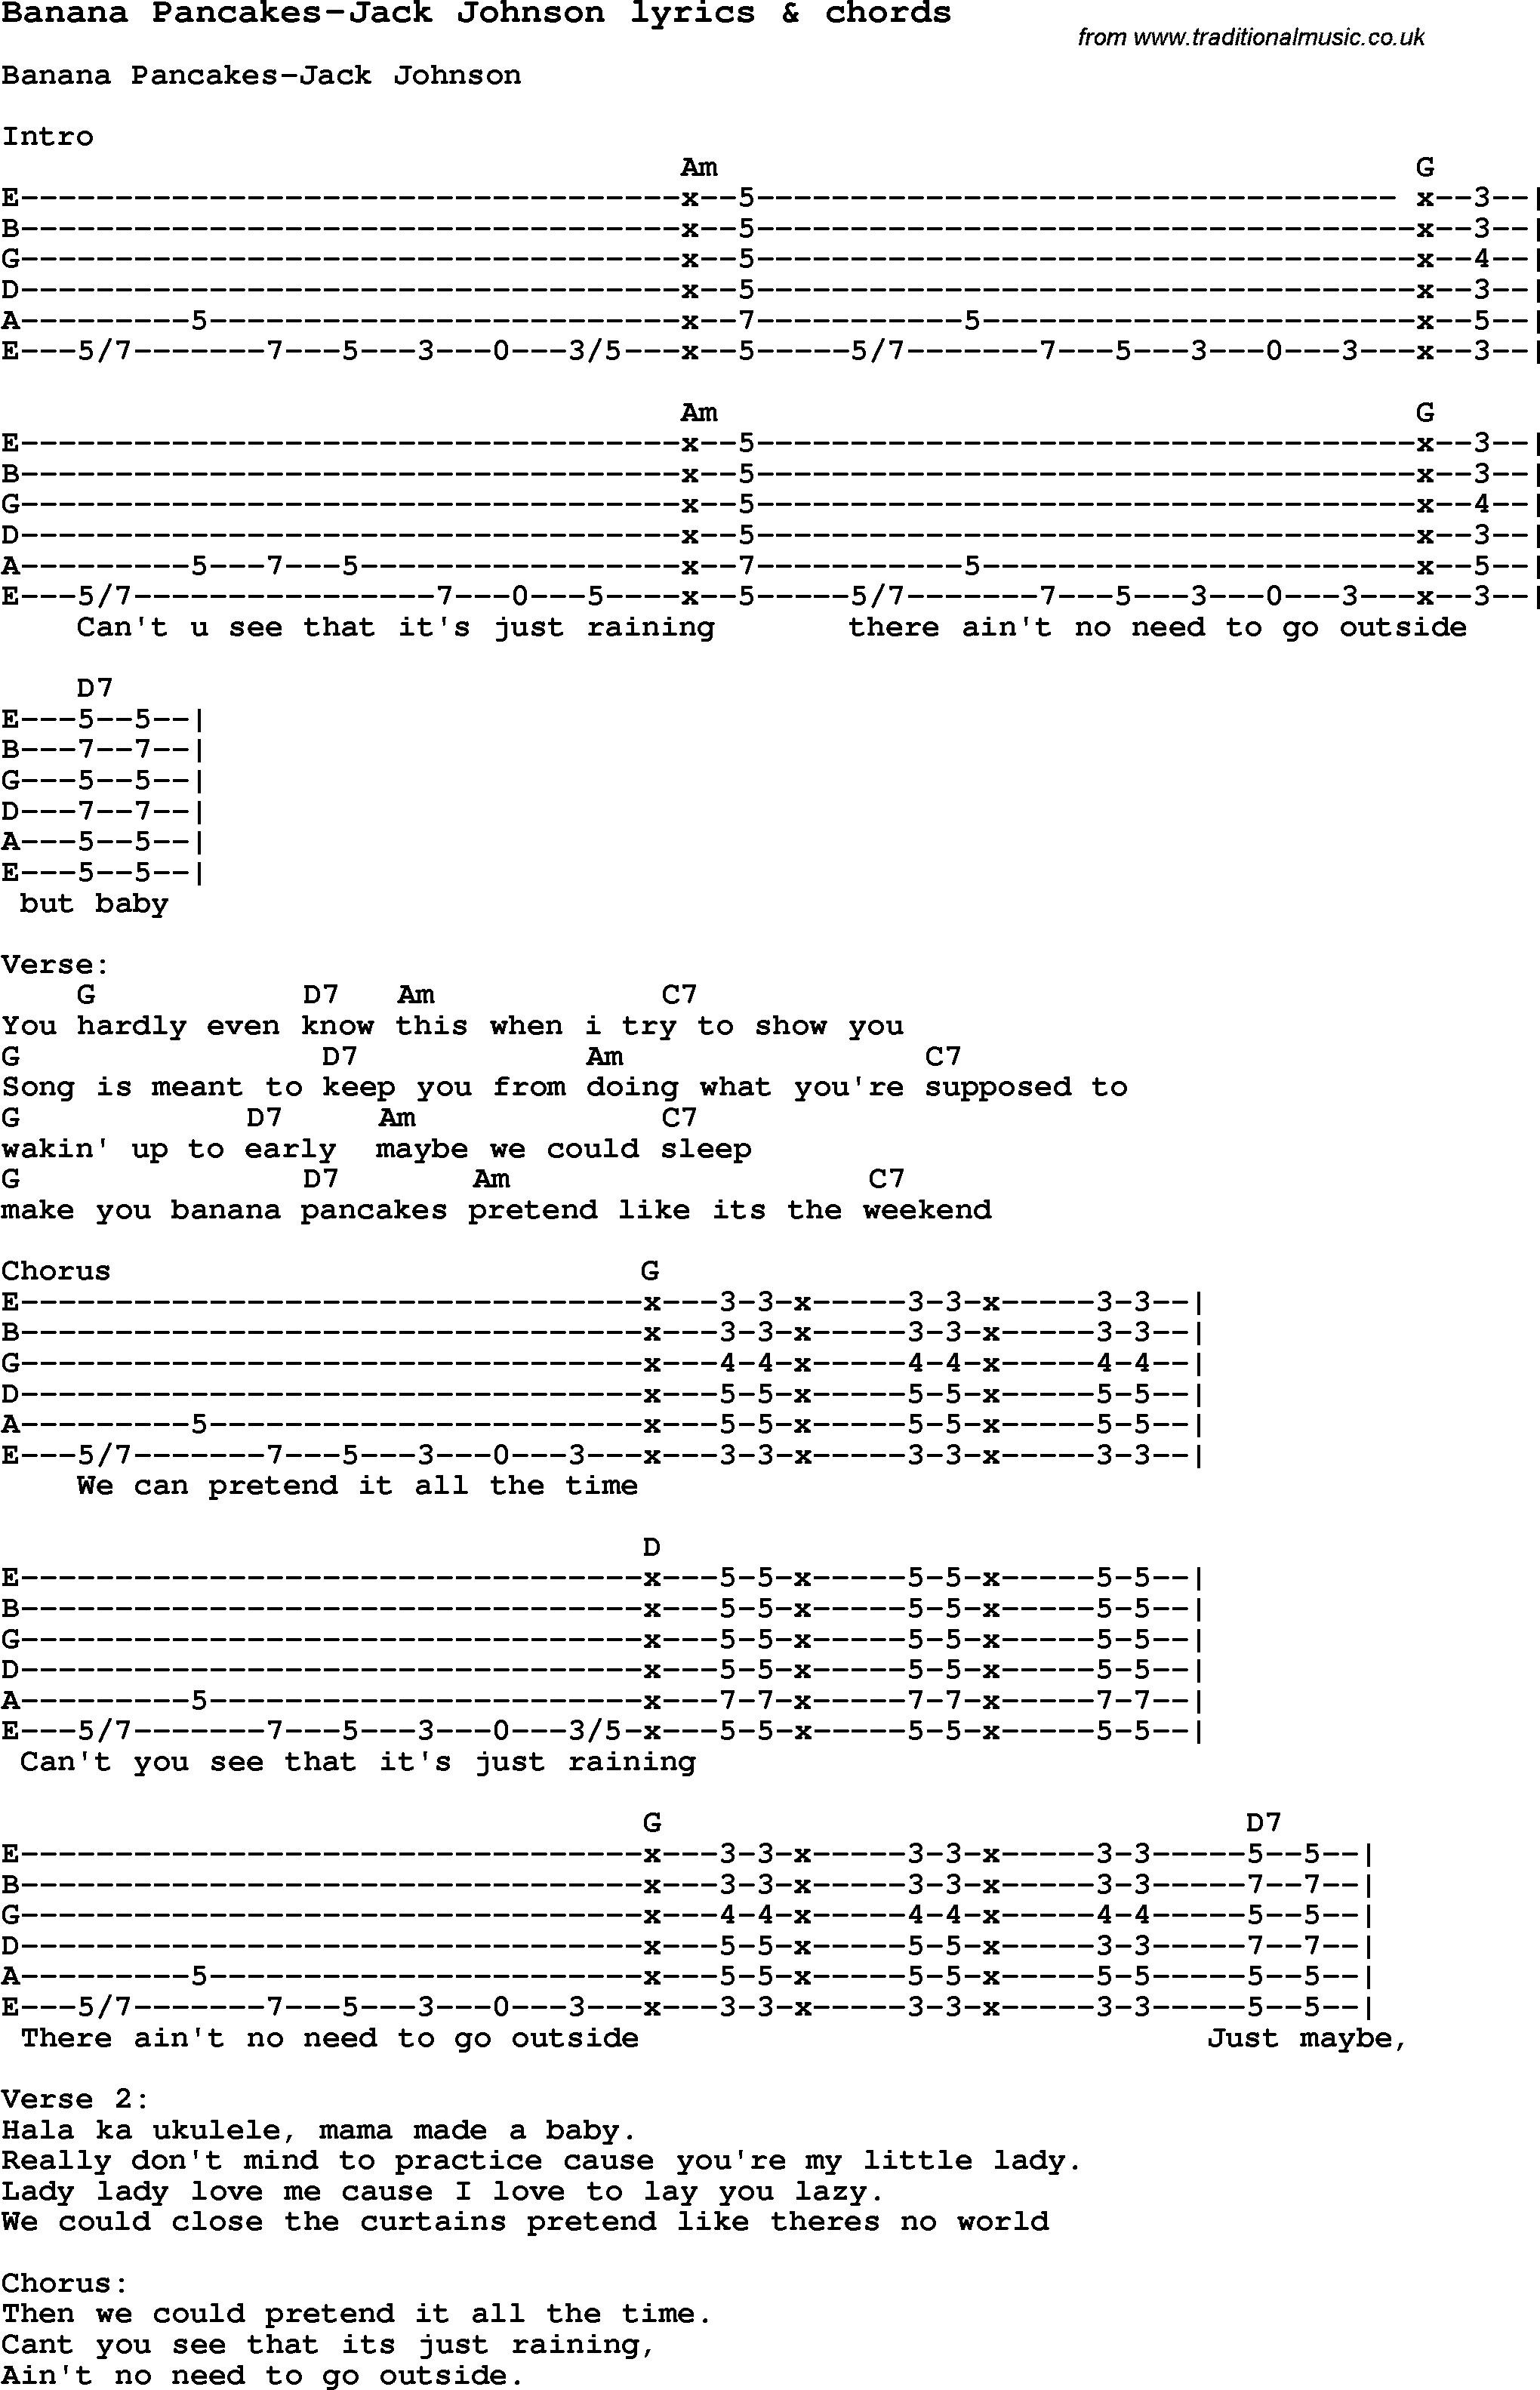 Banana Pancakes Ukulele Chords  Love Song Lyrics for Banana Pancakes Jack Johnson with chords